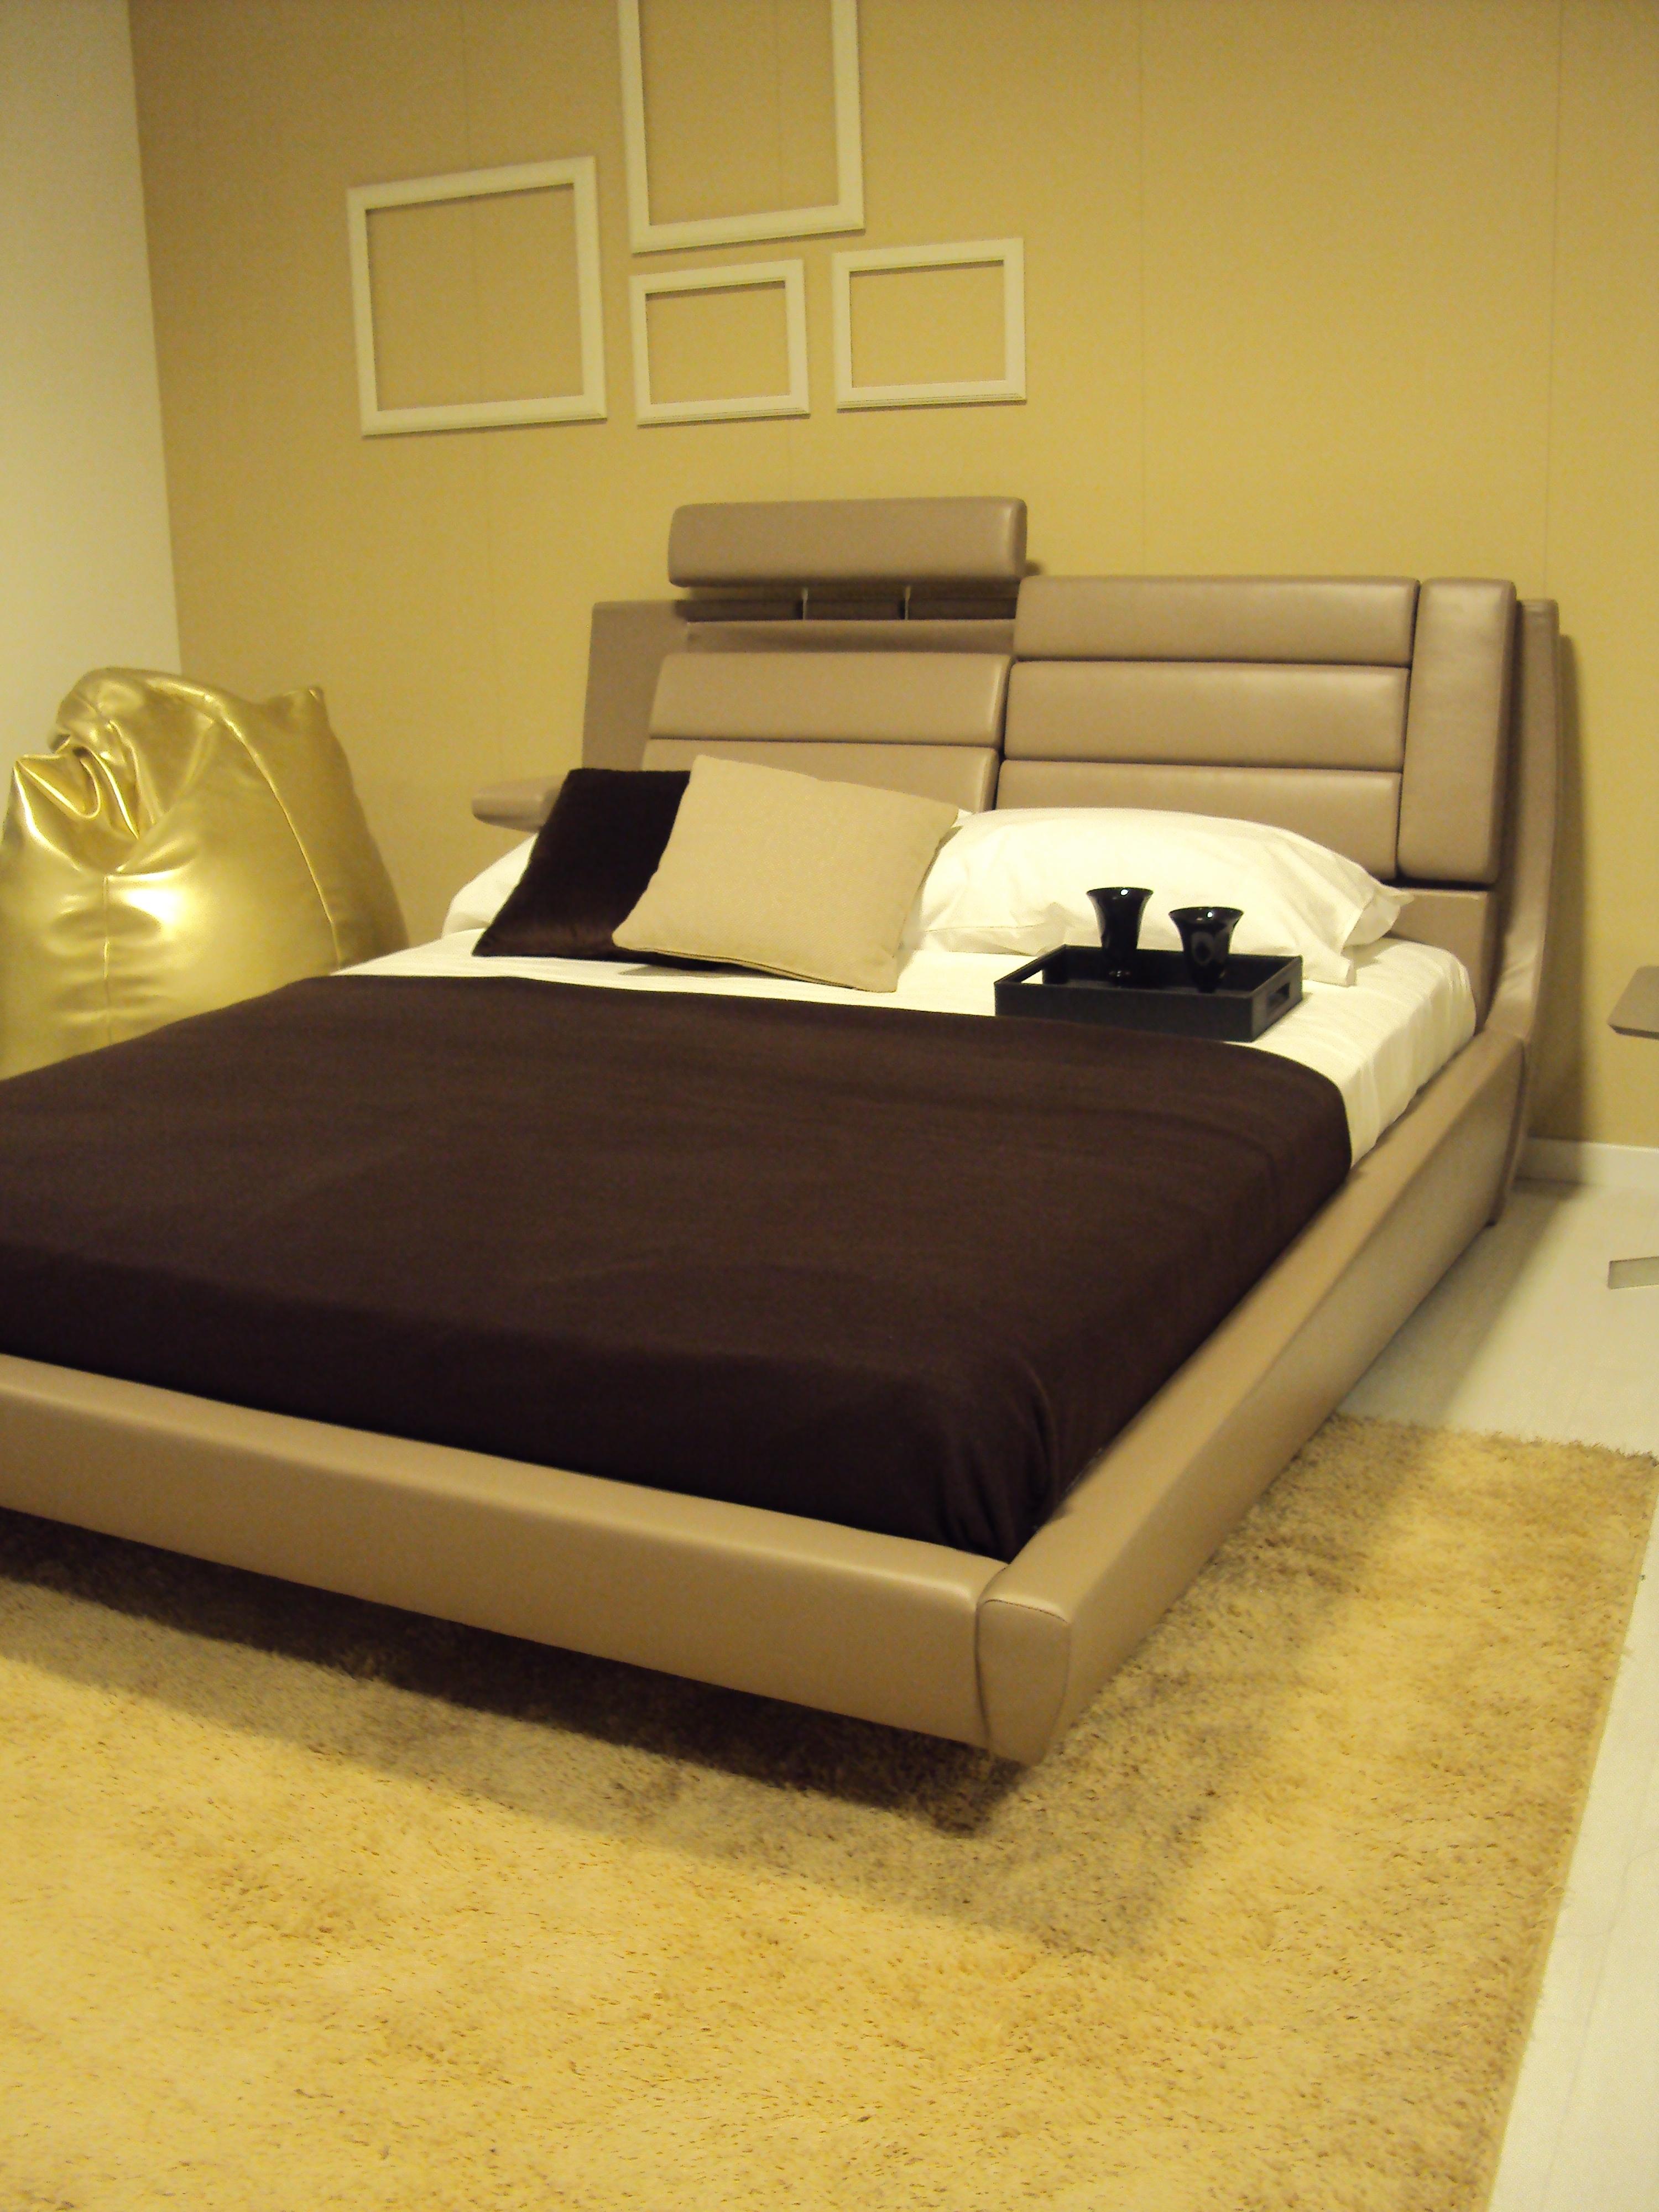 Letto imbottito matrimoniale e moderno massimo comfort for Letto imbottito moderno